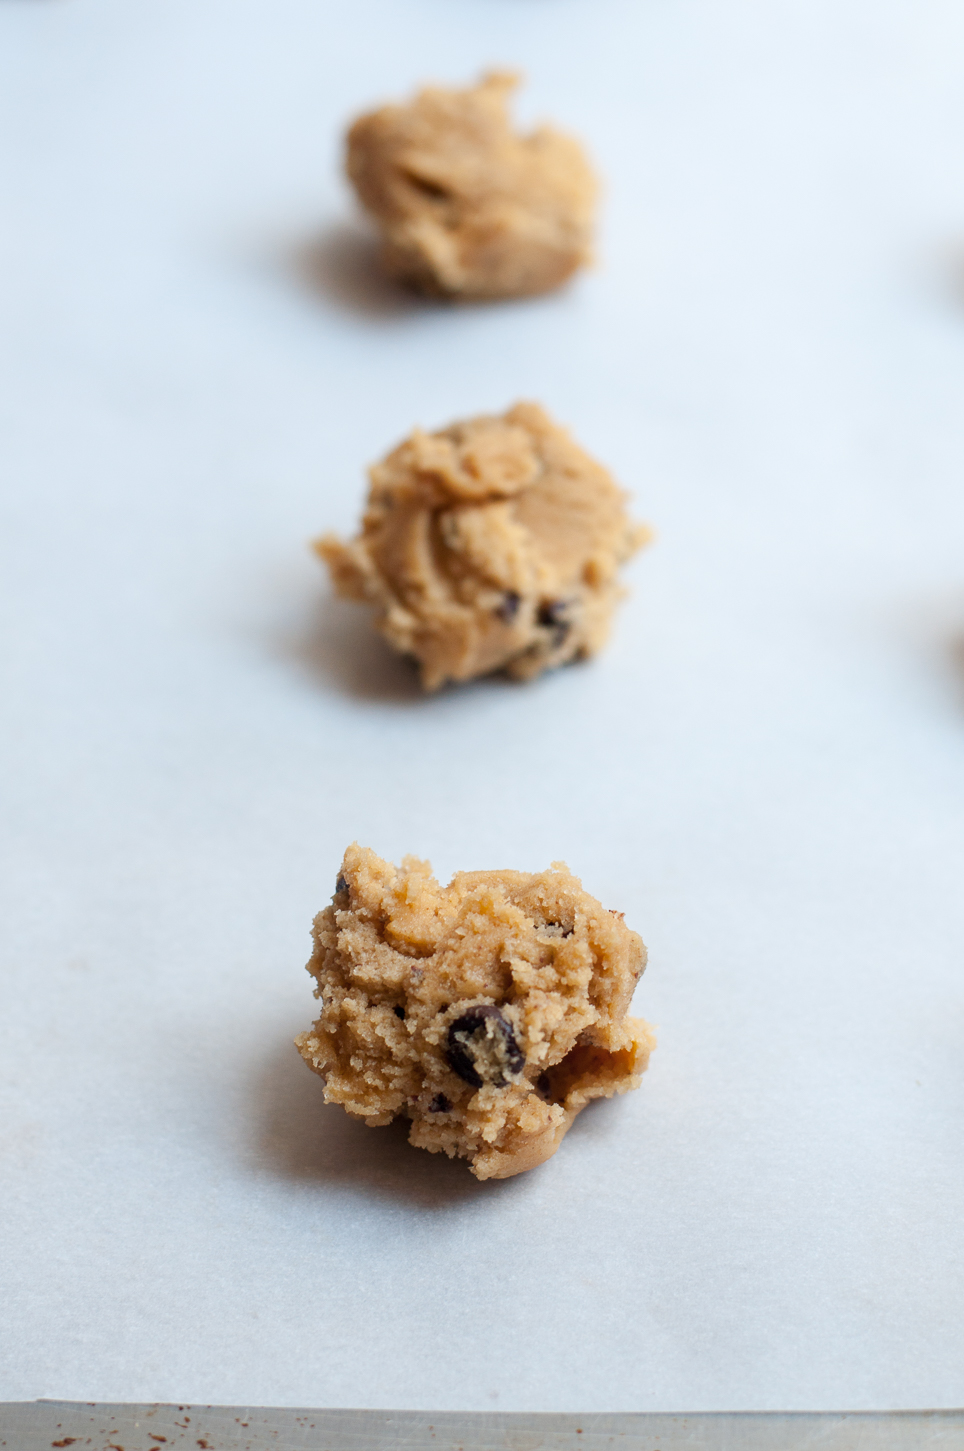 Meine aktuellen Lieblingskekse: Rocky Road Cookies #Erdnuss #Schokolade #Marshmallows